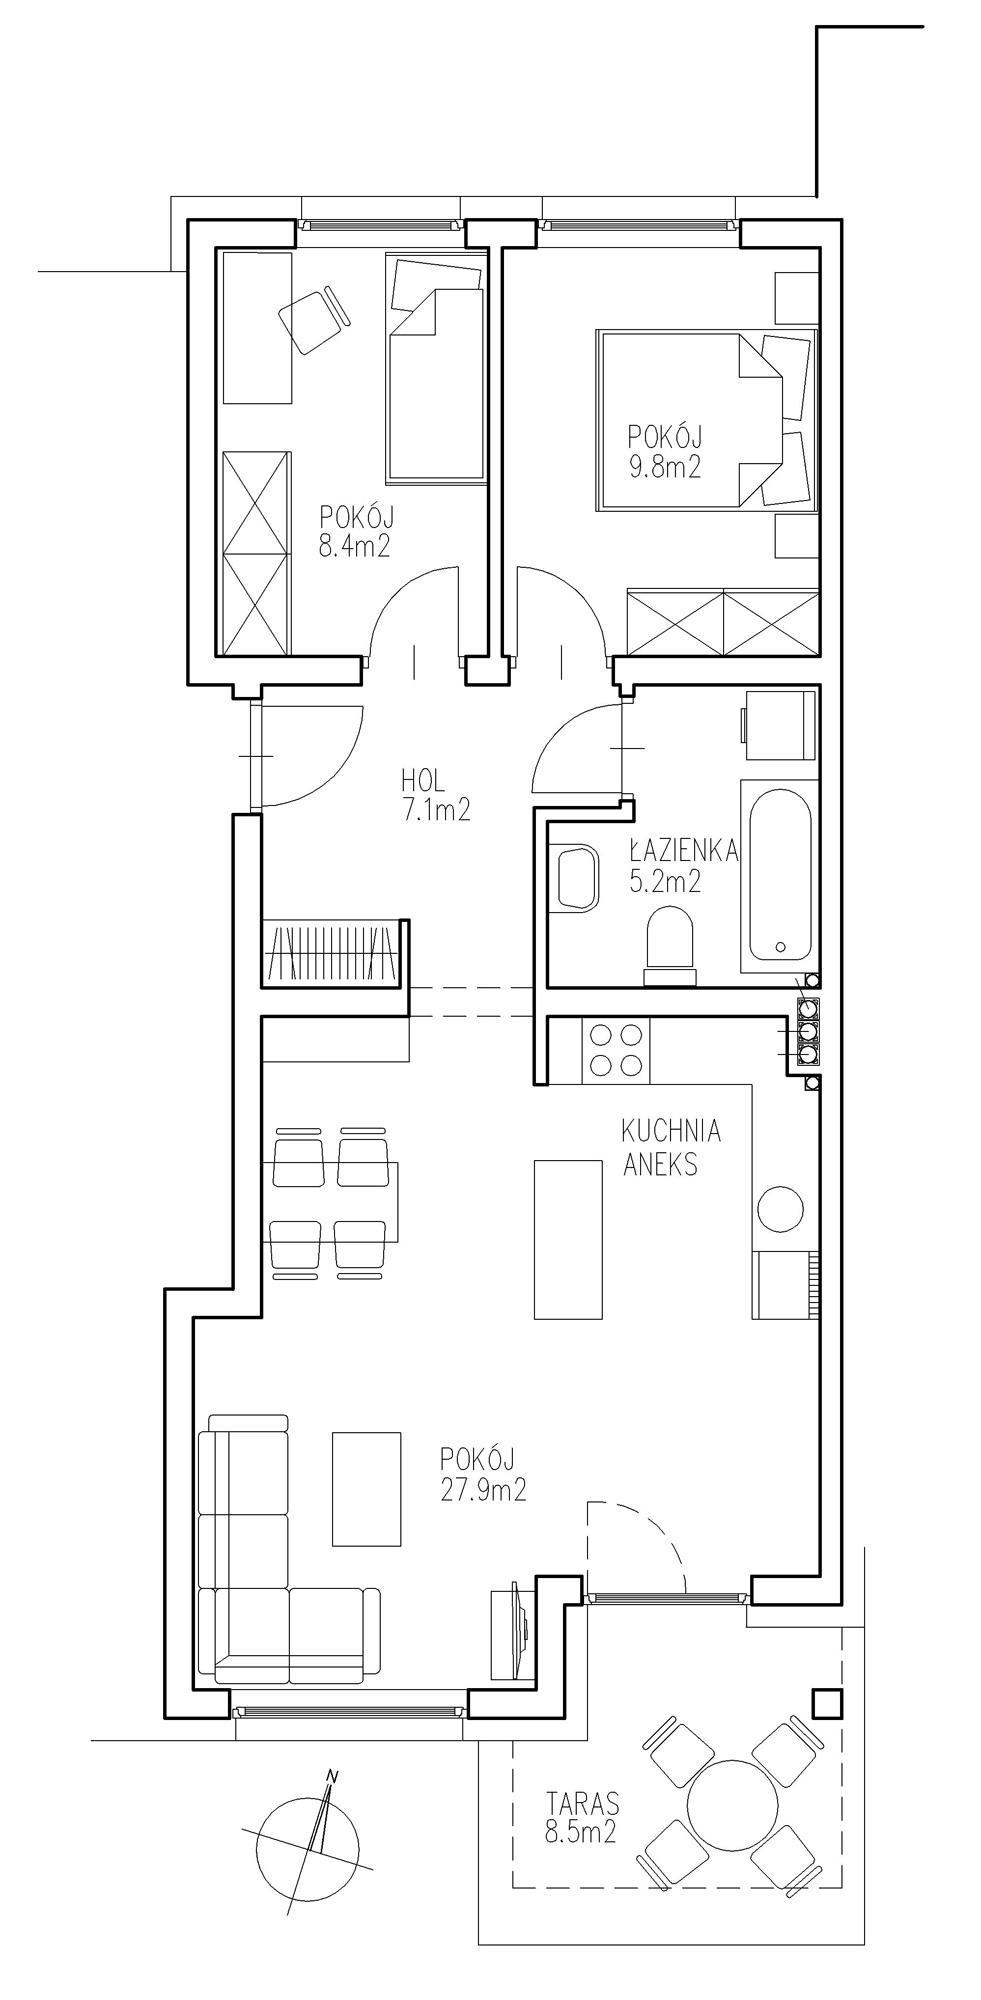 KTK Deweloper - Ełk - ul. Ogrodowa - Blok nr 2 - Mieszkanie nr 7